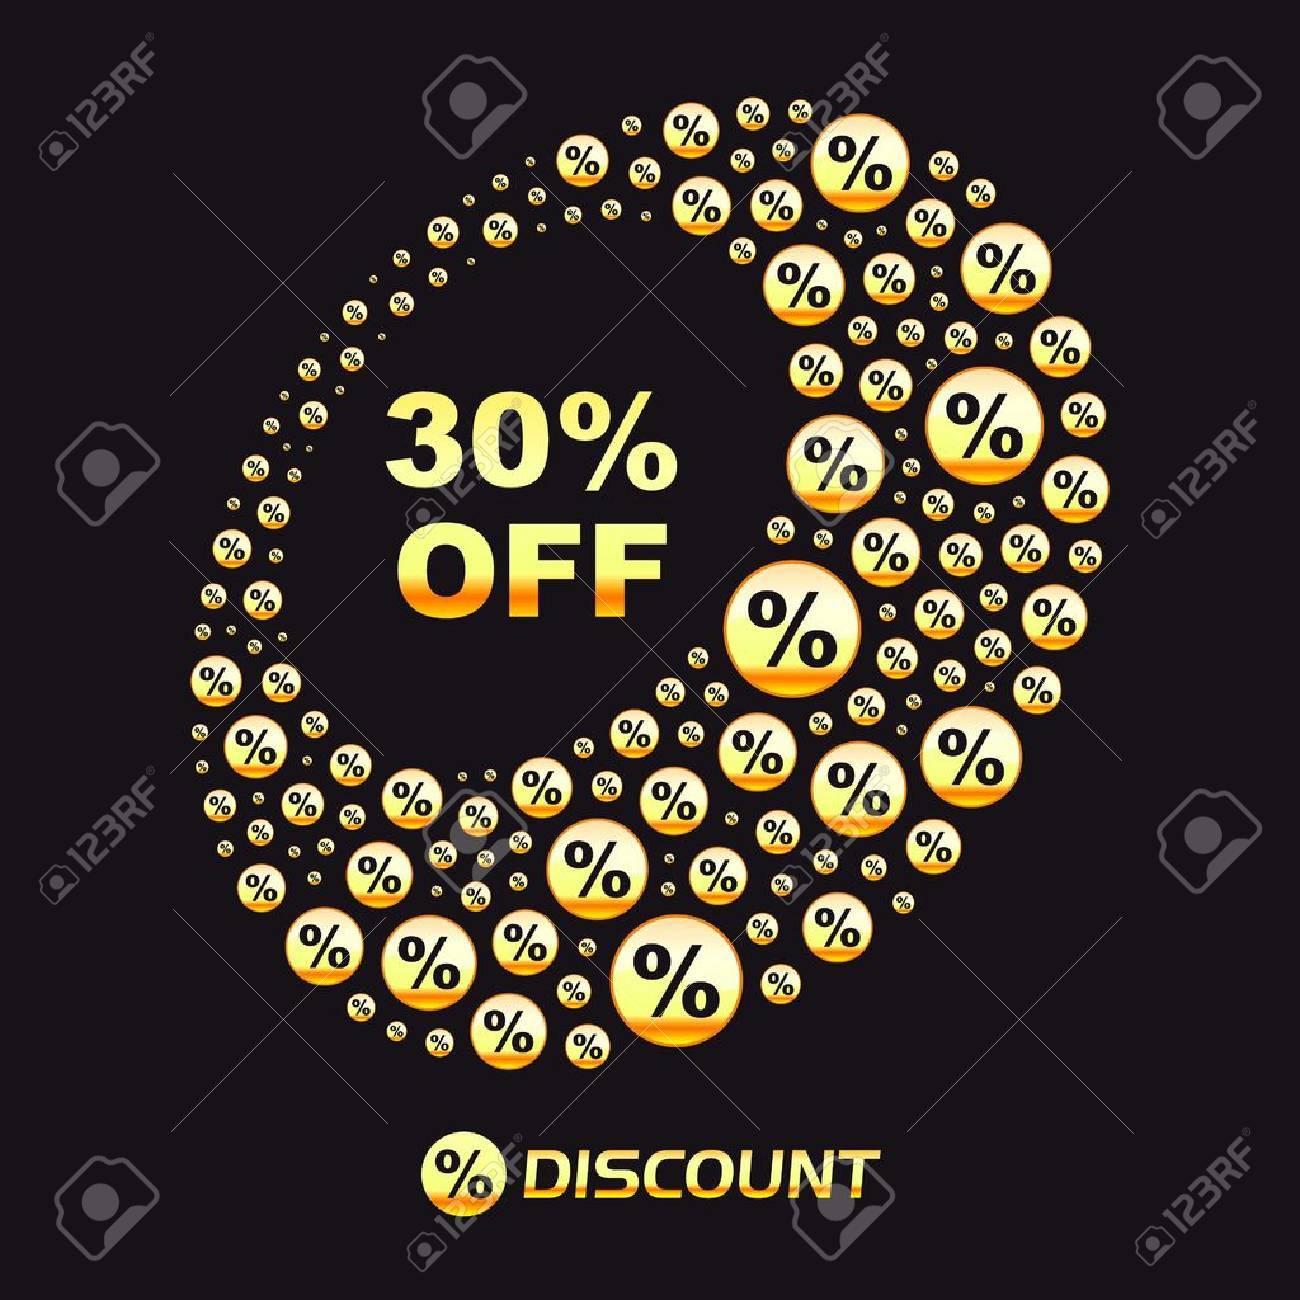 Discount illustration. Stock Vector - 11269240